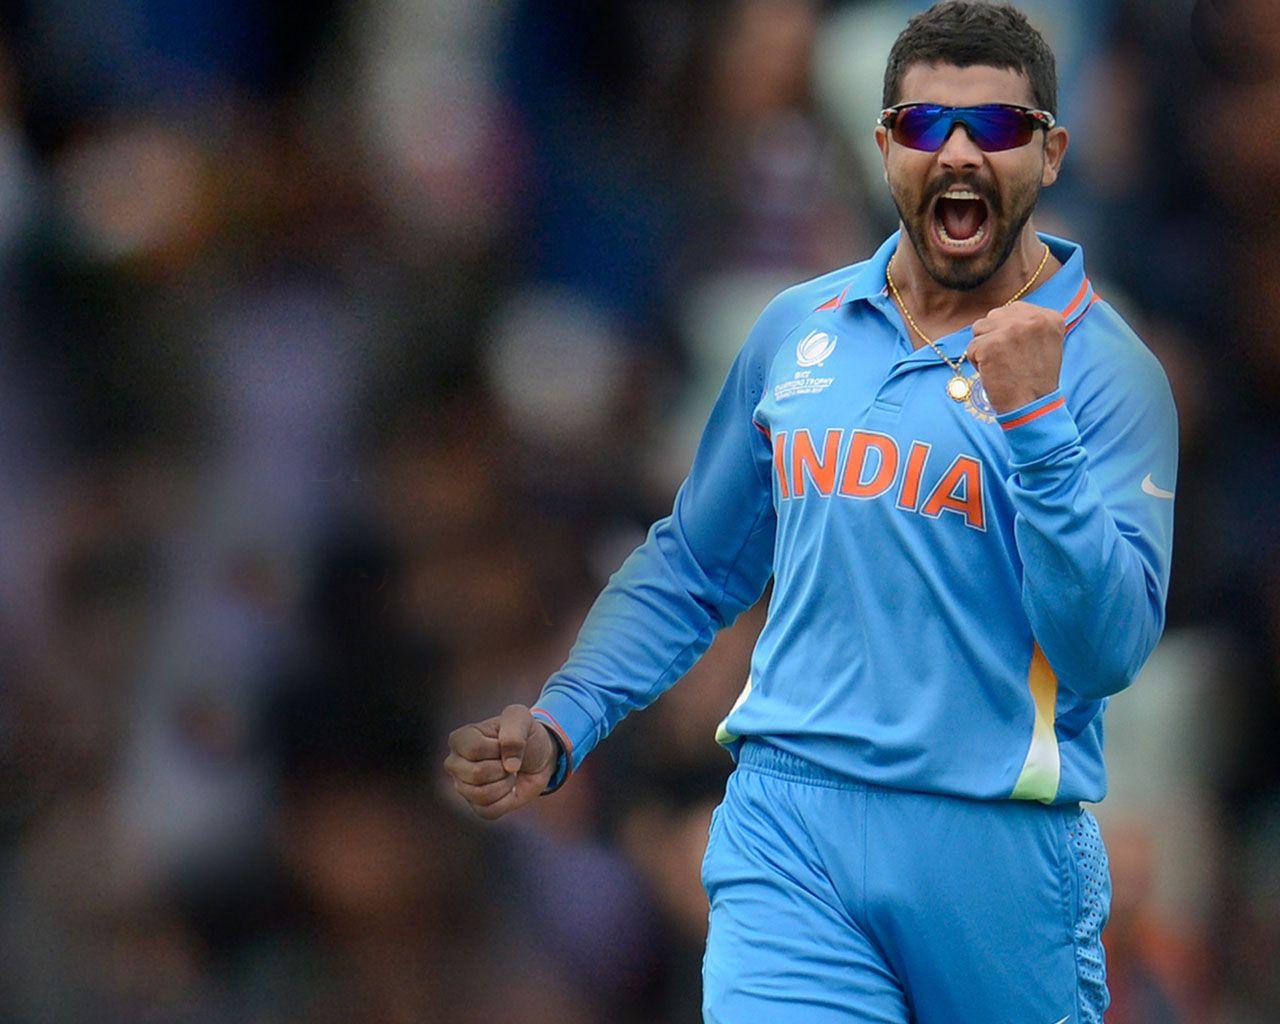 ravindra jadeja indian cricketer hd wallpaper Indian